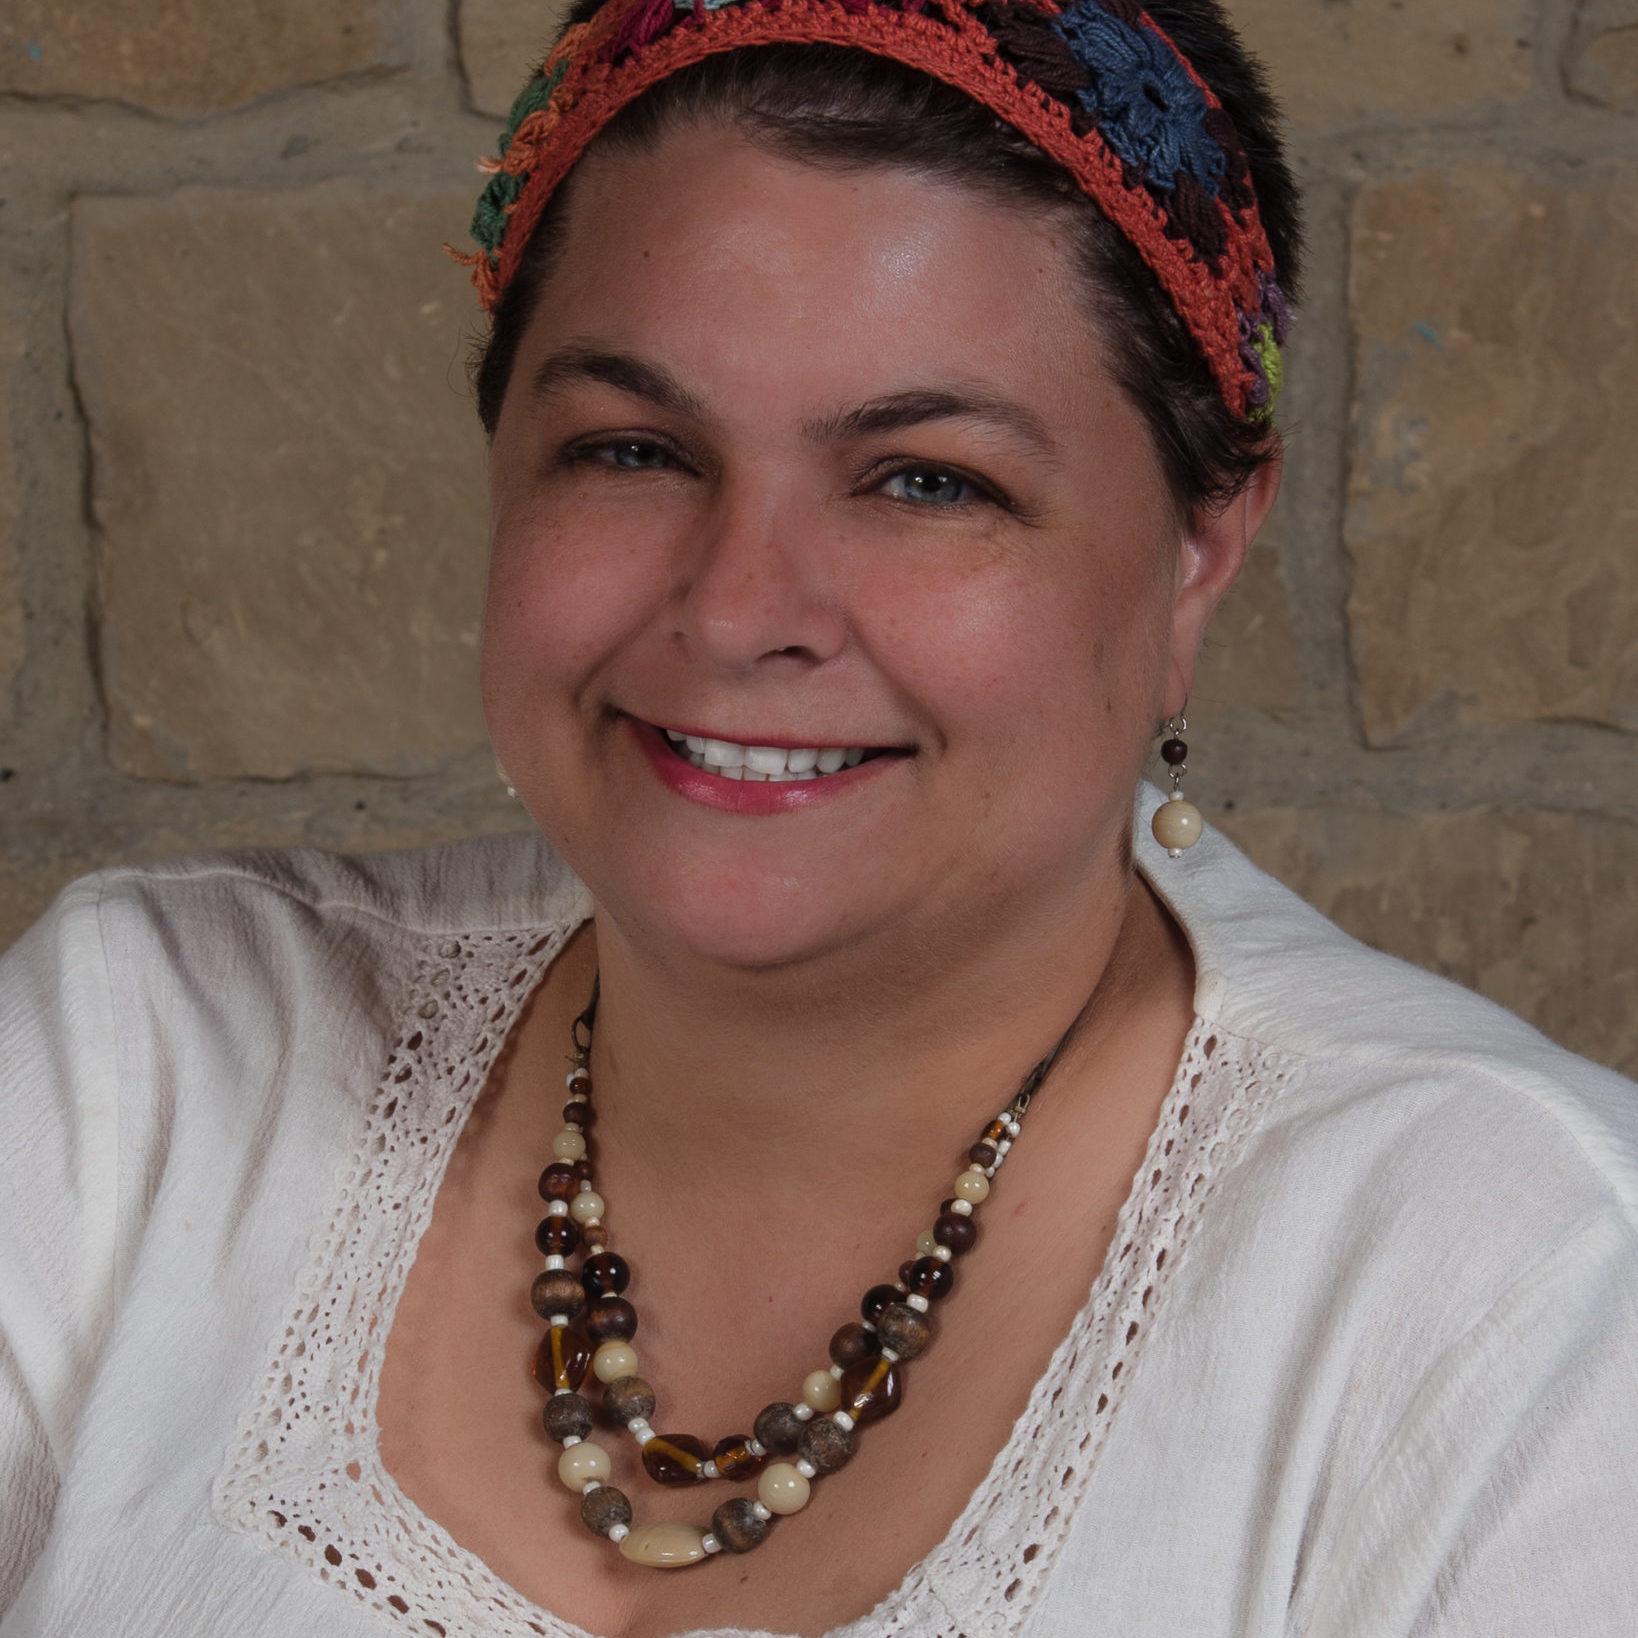 About Mercy Eizenga, Head midwife